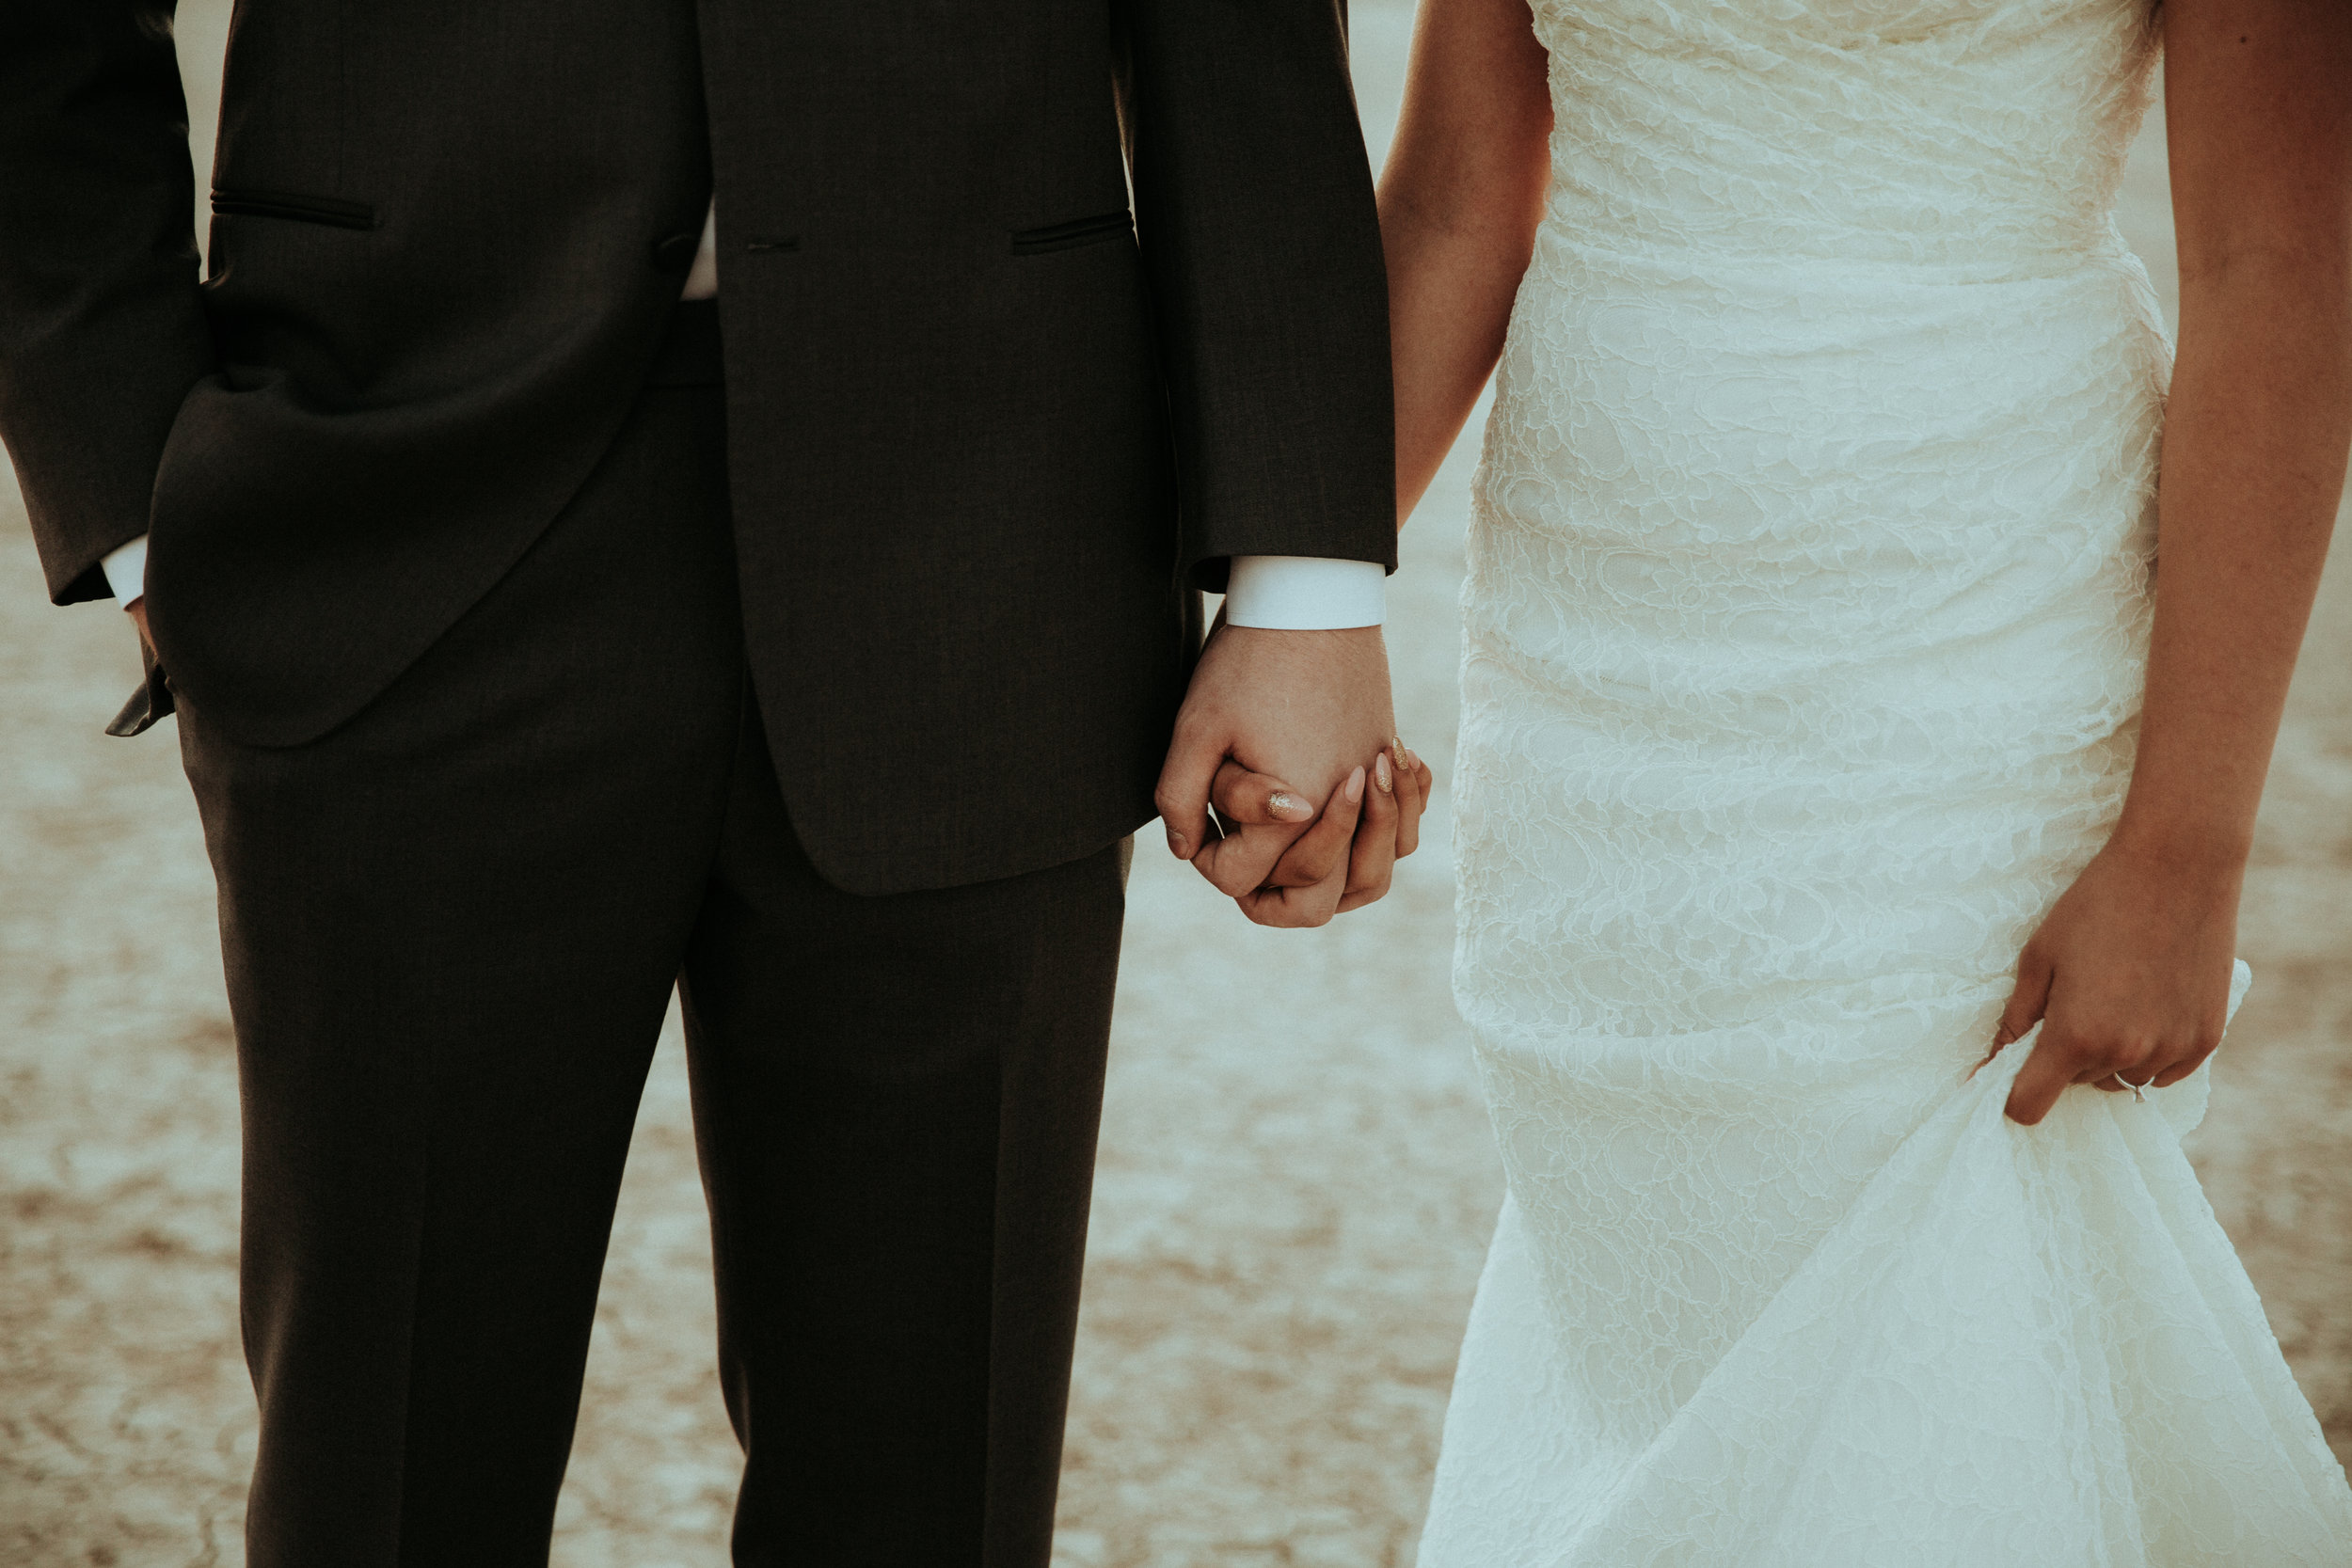 Las Vegas Wedding Photography - Seattle Wedding Photographer - Henderson, NV - PNW Wedding Photographer - Washington Wedding Photographer - Oregon Wedding Photographer